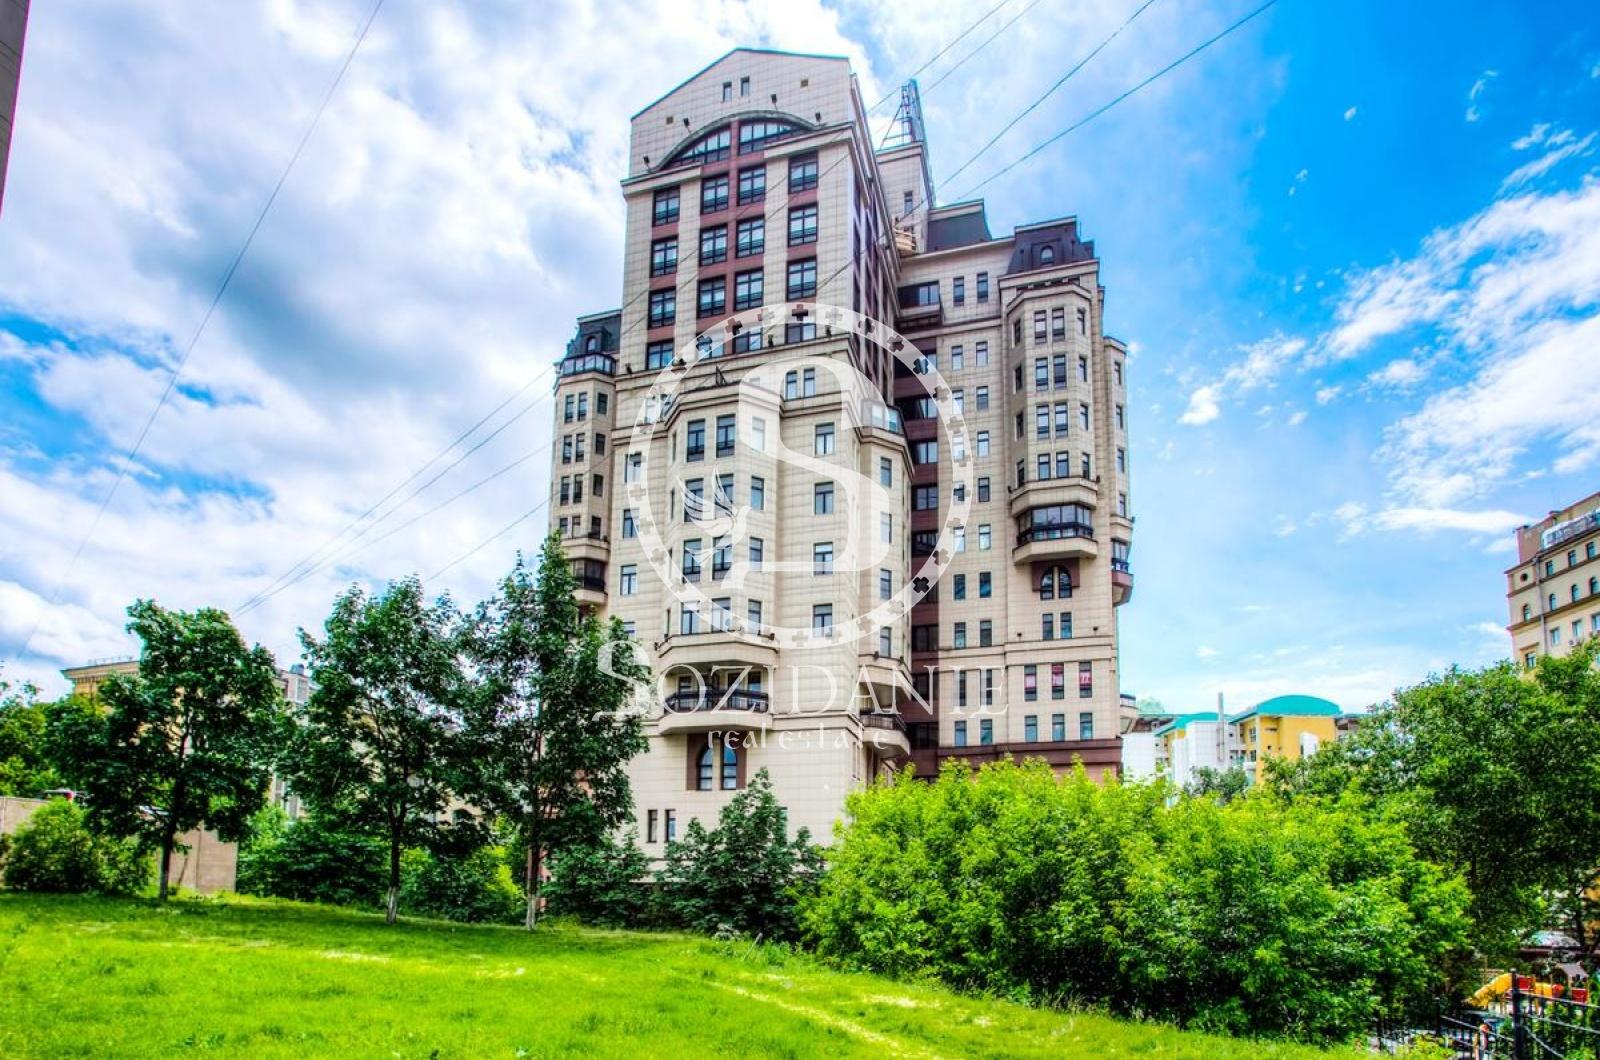 4 Комнаты, Городская, Продажа, Улица Новый Арбат, Listing ID 3483, Москва, Россия,